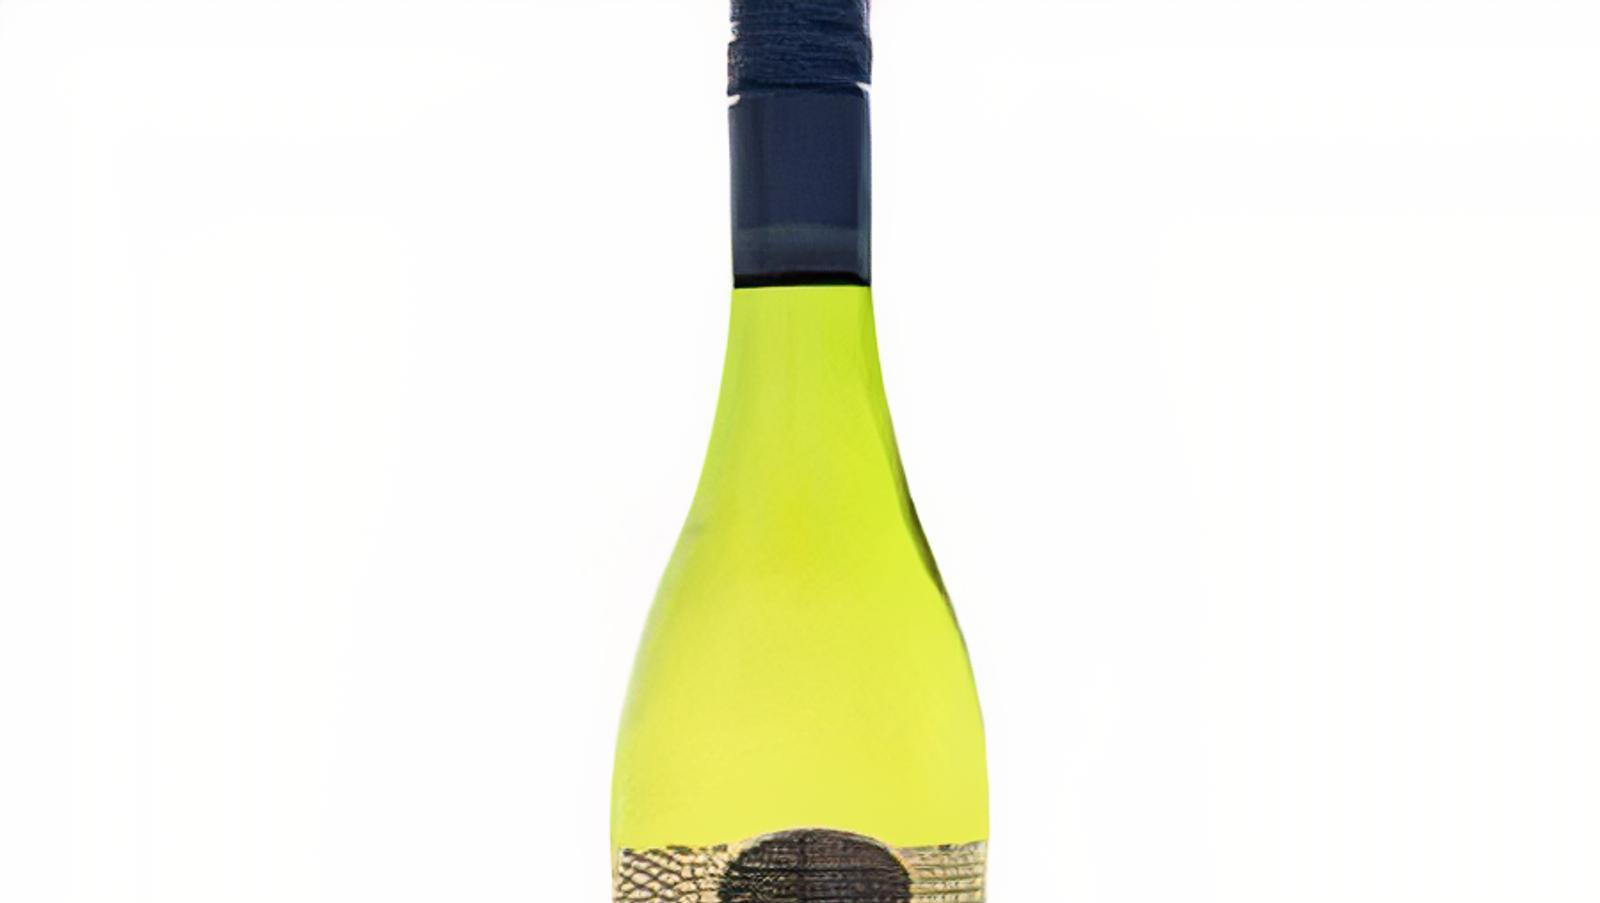 Oyster Bay Sauvignon Blanc, 750mL white wine (12.5% ABV)